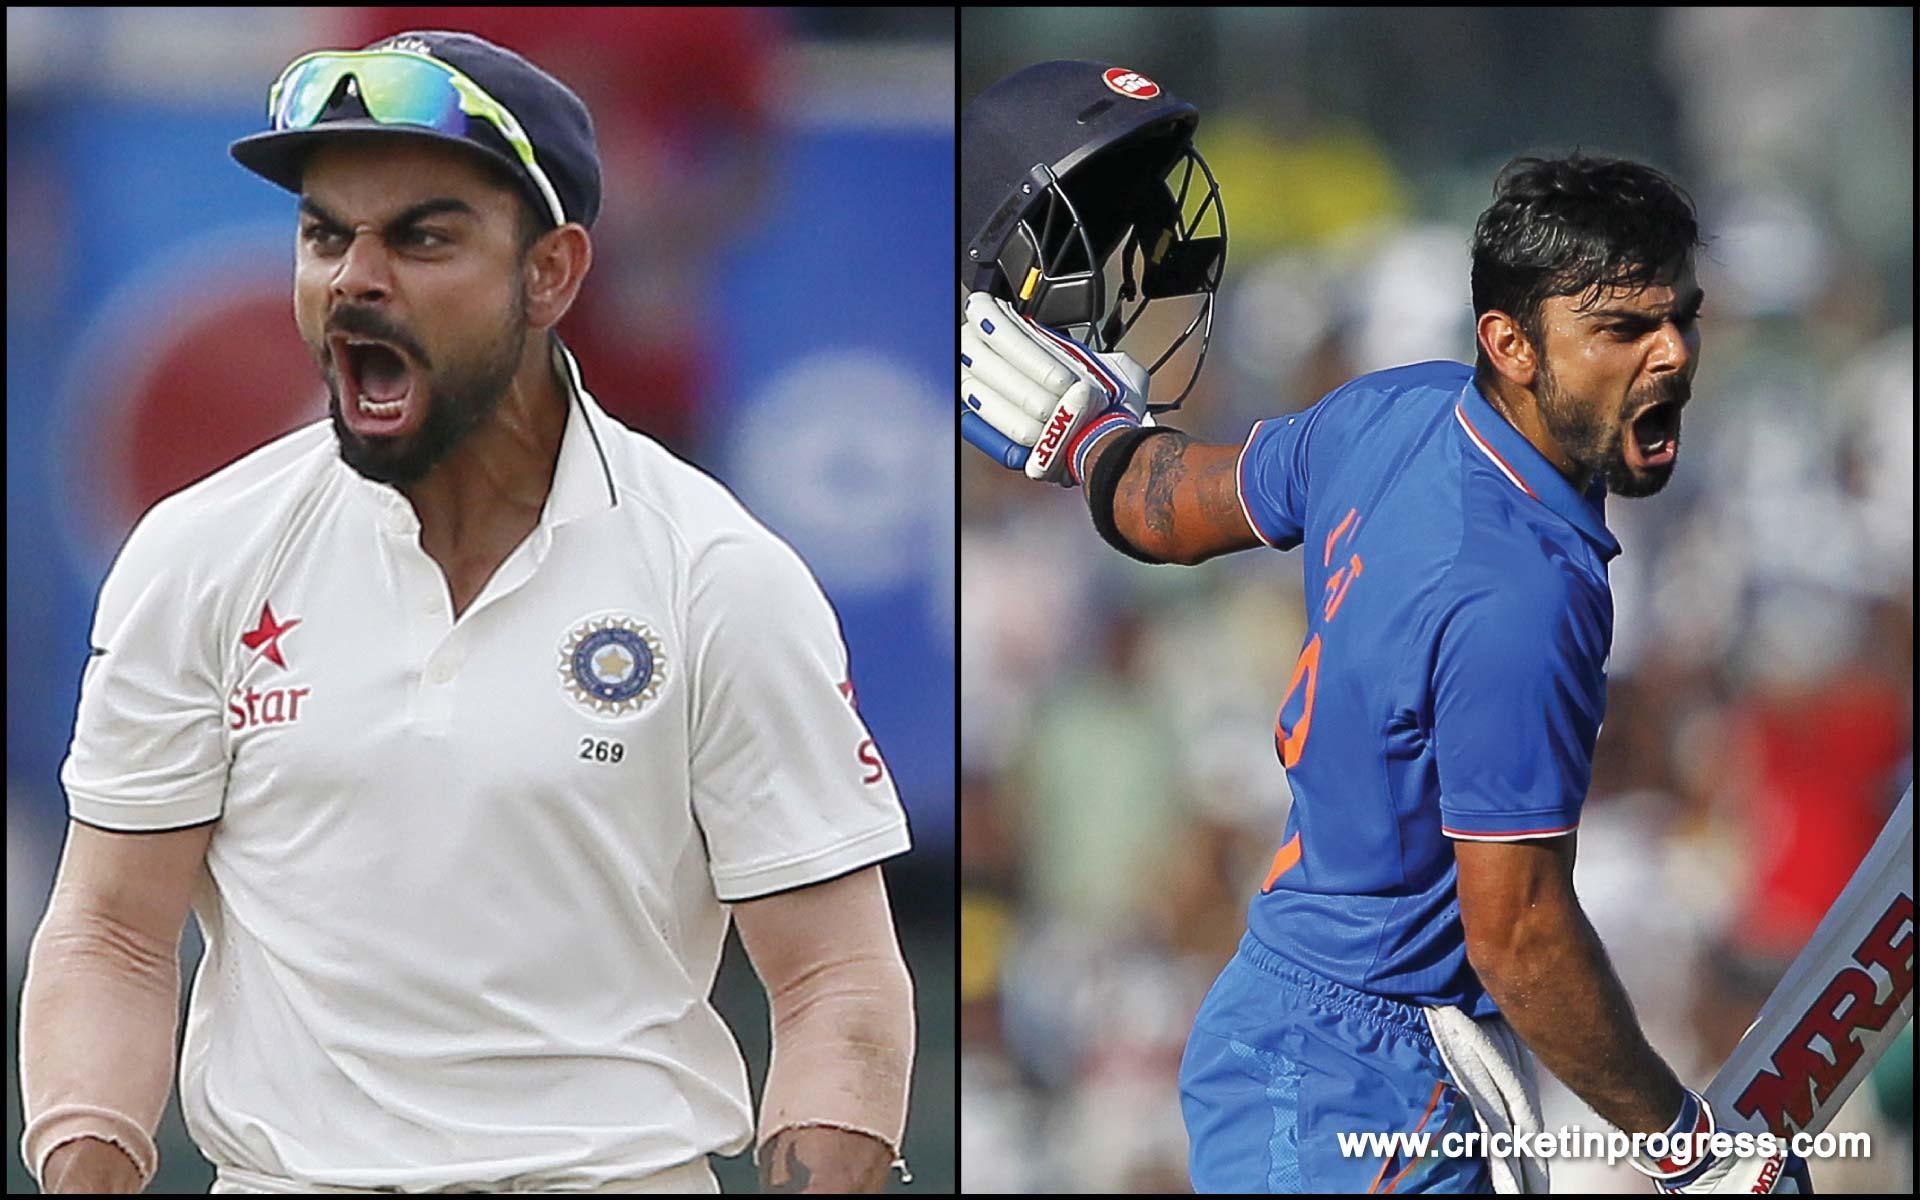 Virat Kohli's real 'test' begins now